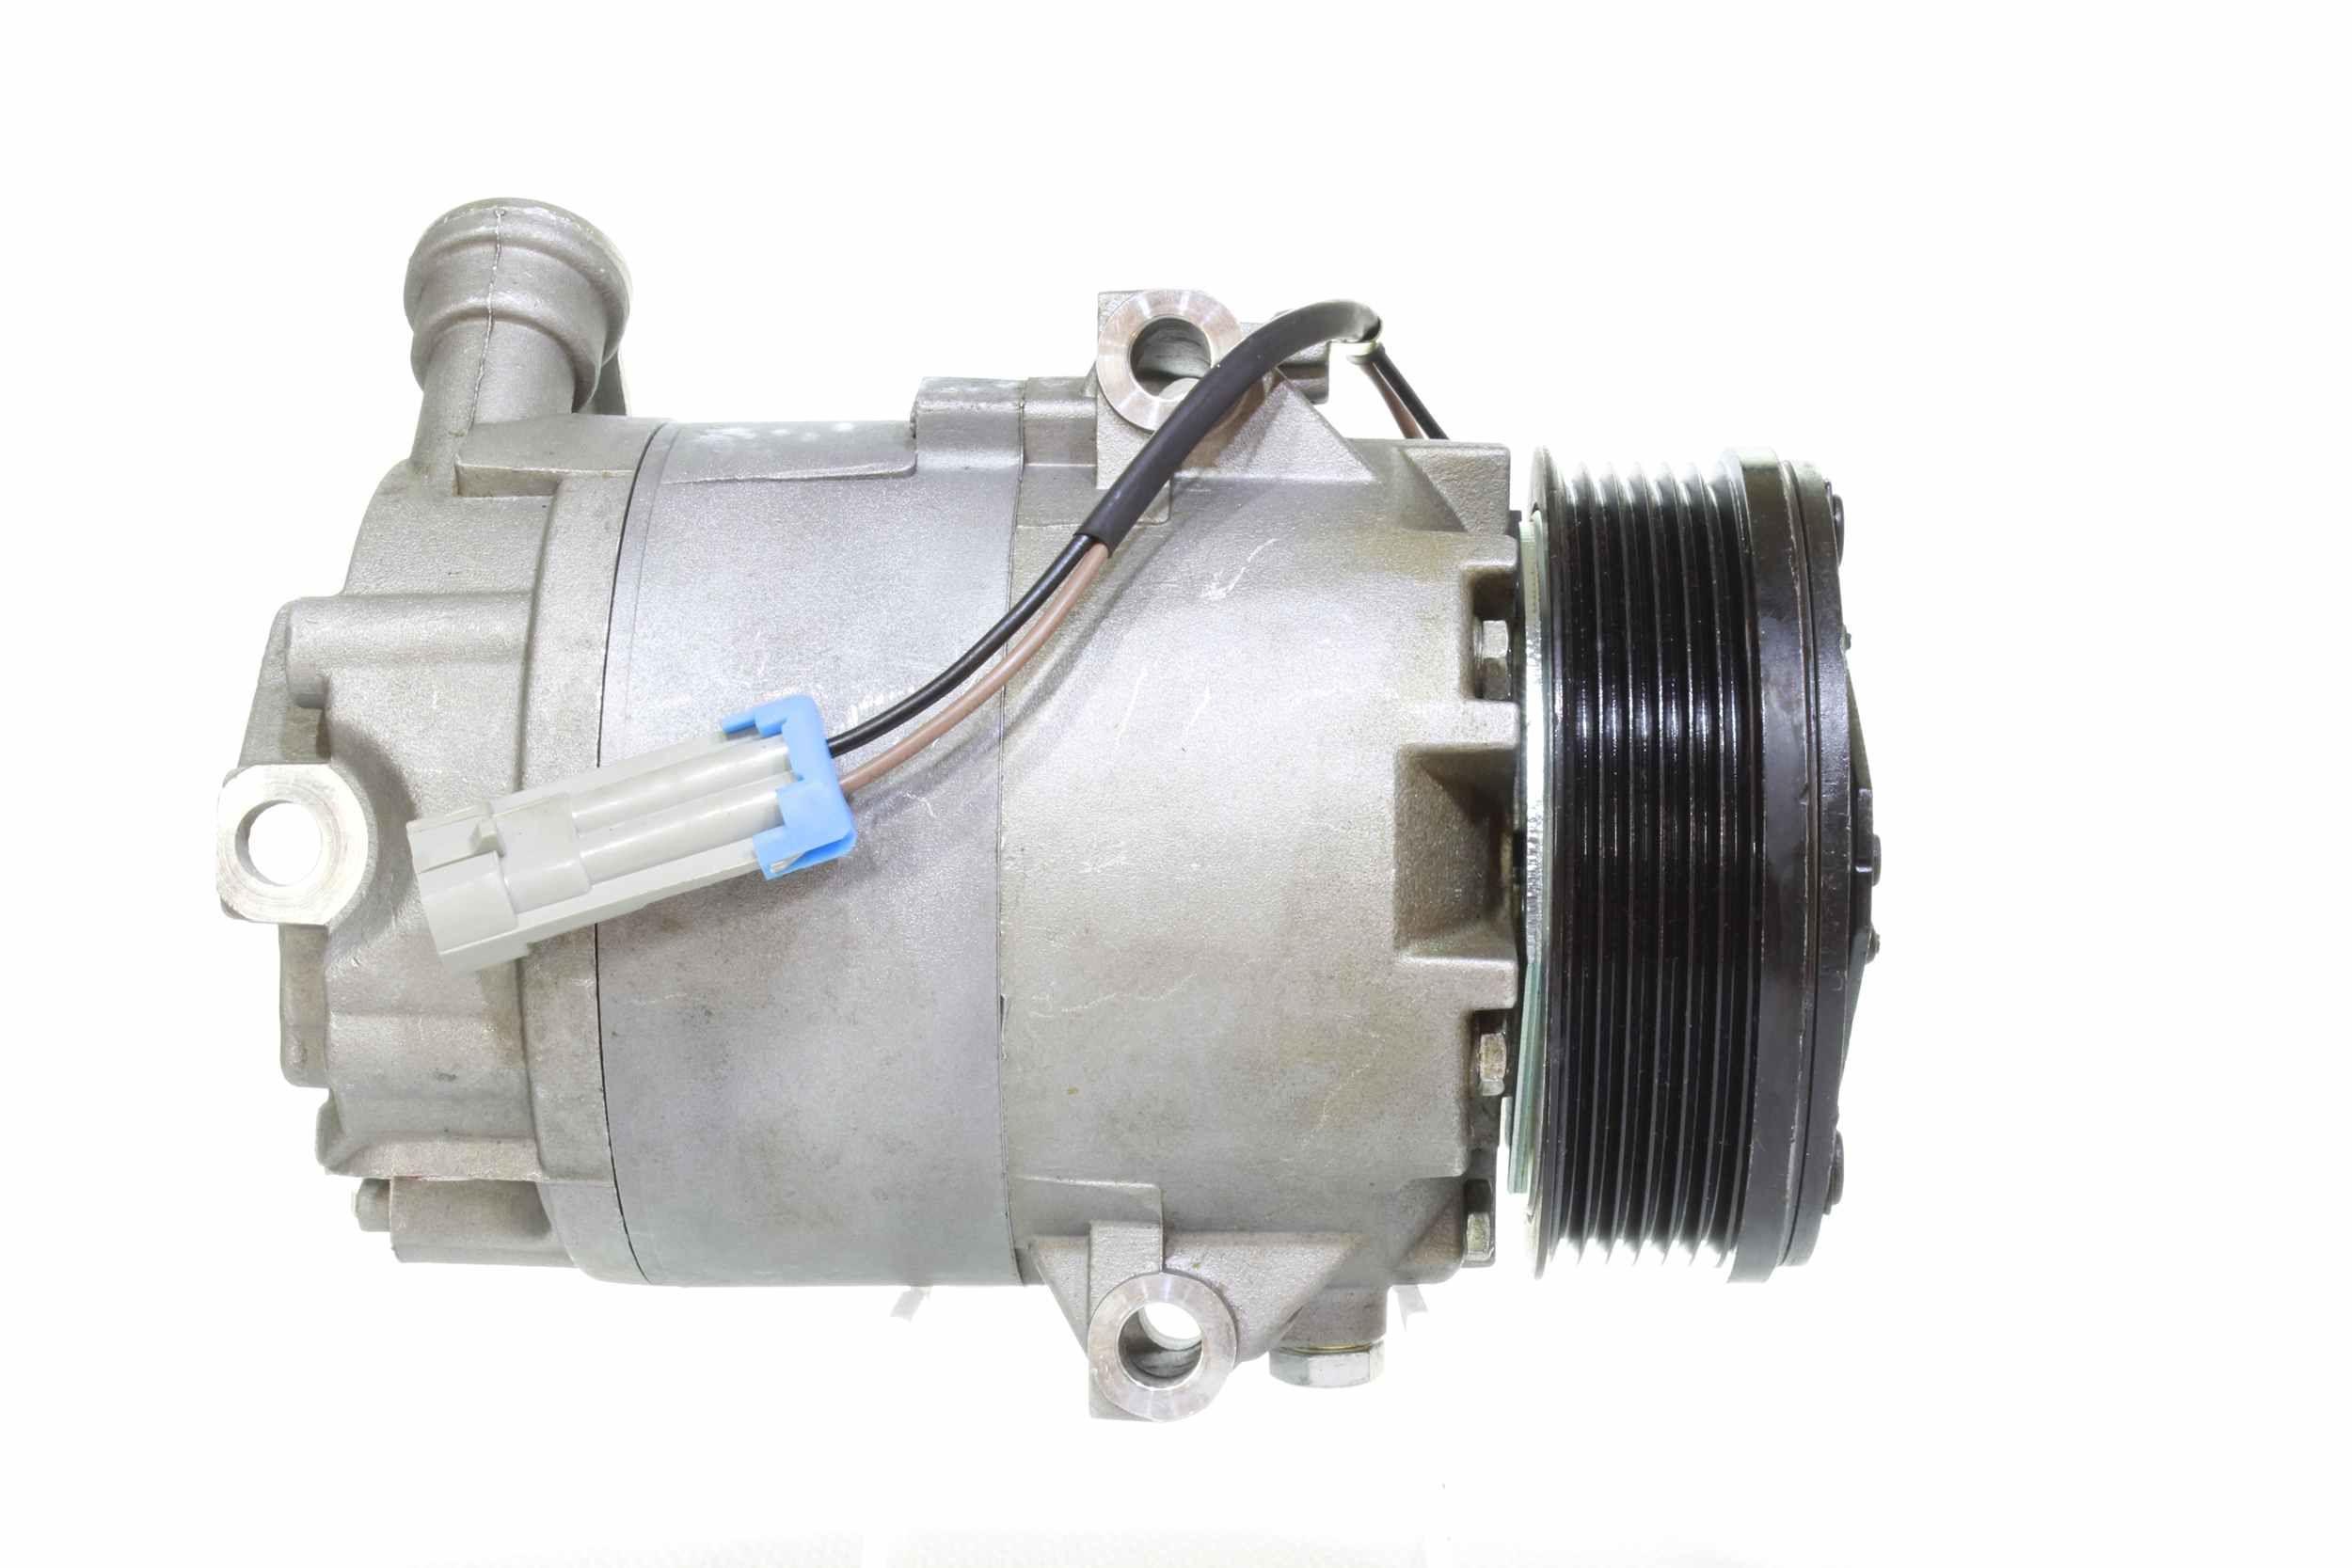 10550072 Klimaanlage Kompressor ALANKO - Markenprodukte billig